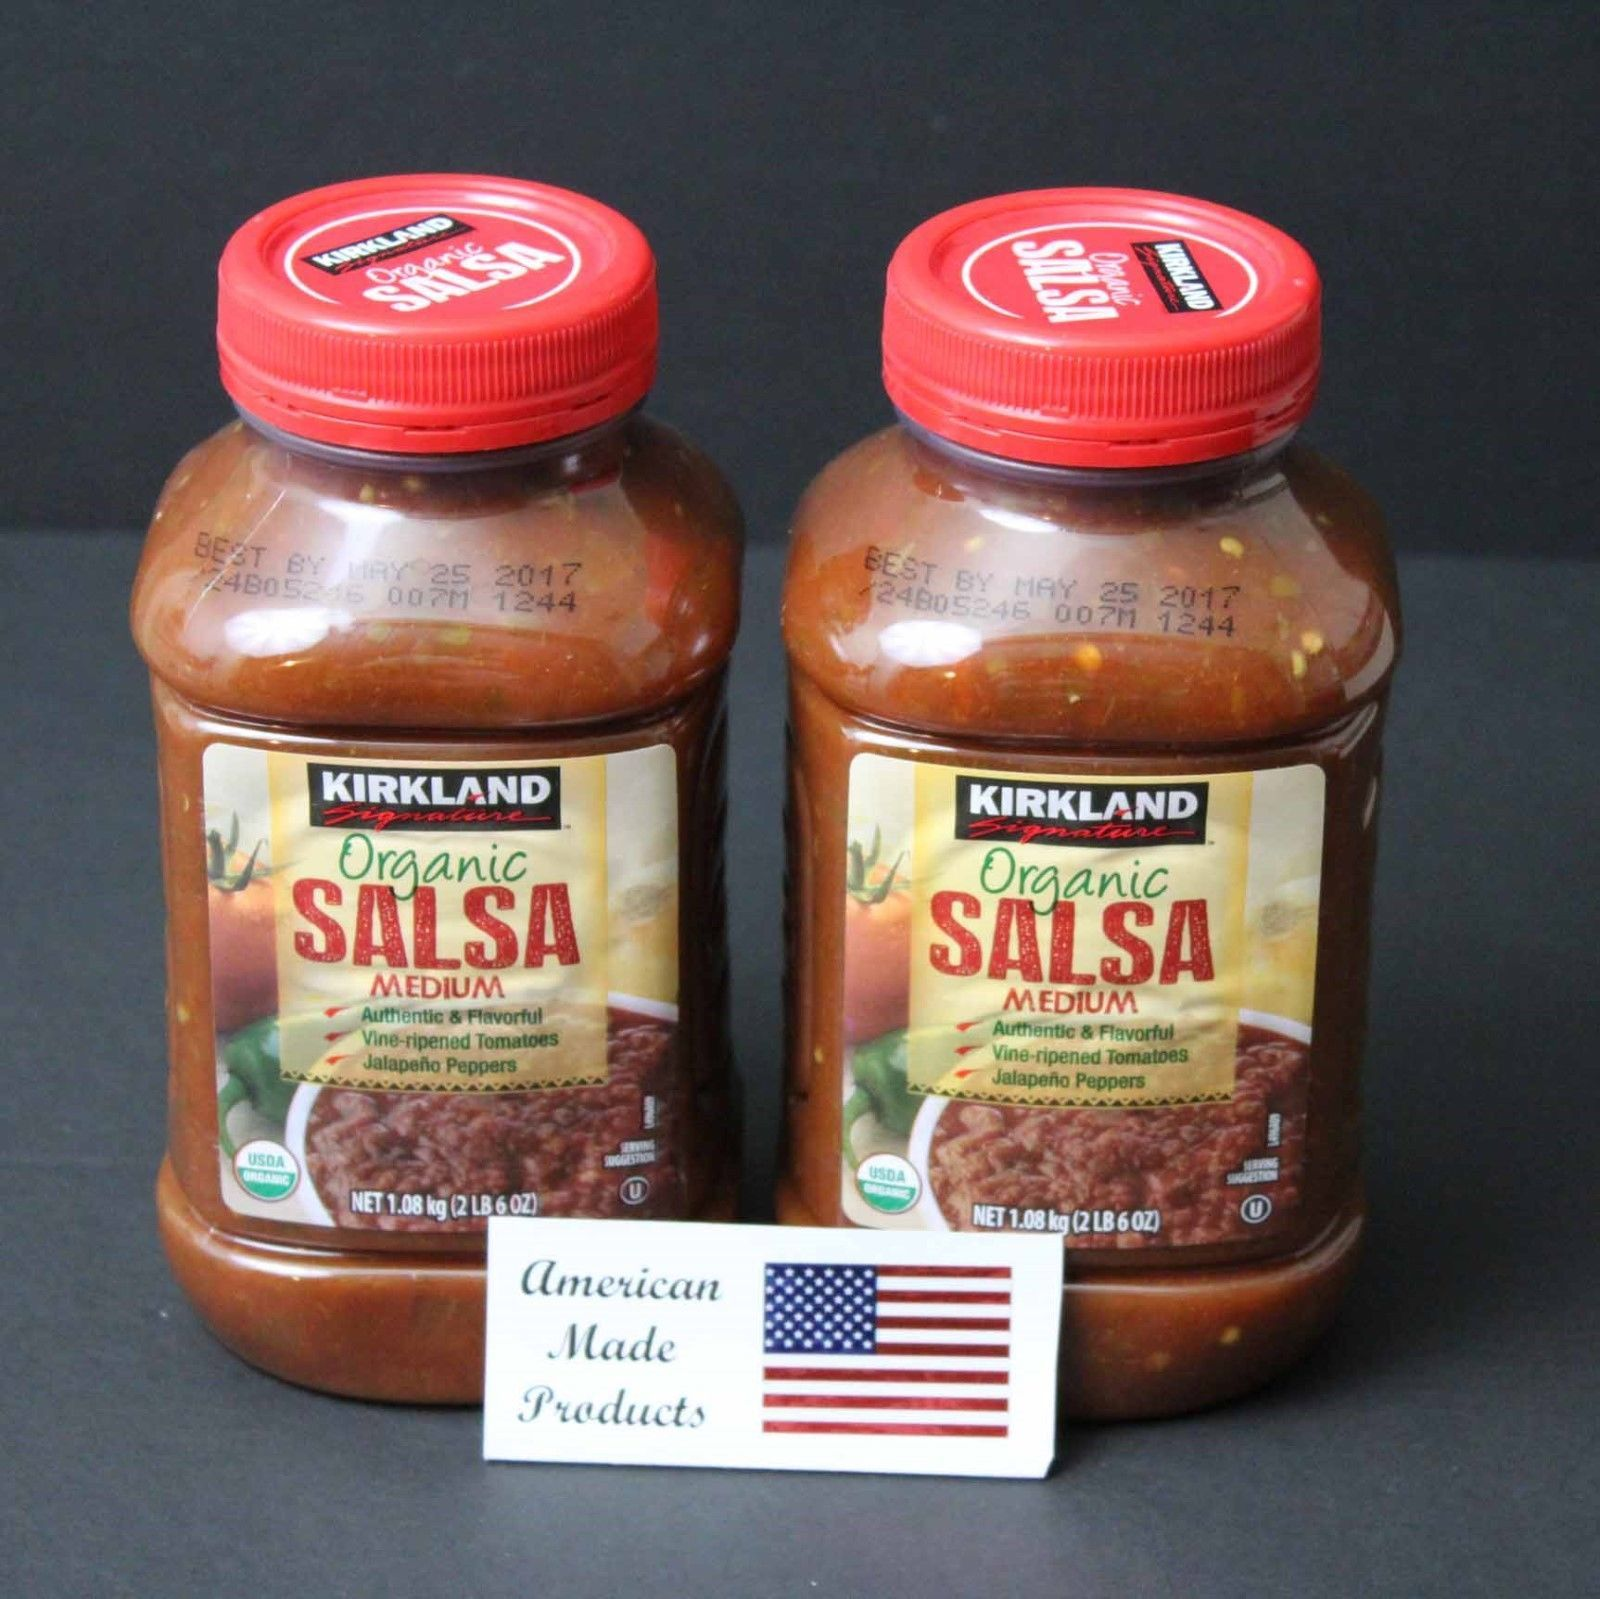 2 pack Kirkland Signature Organic Salsa Medium - $27.76